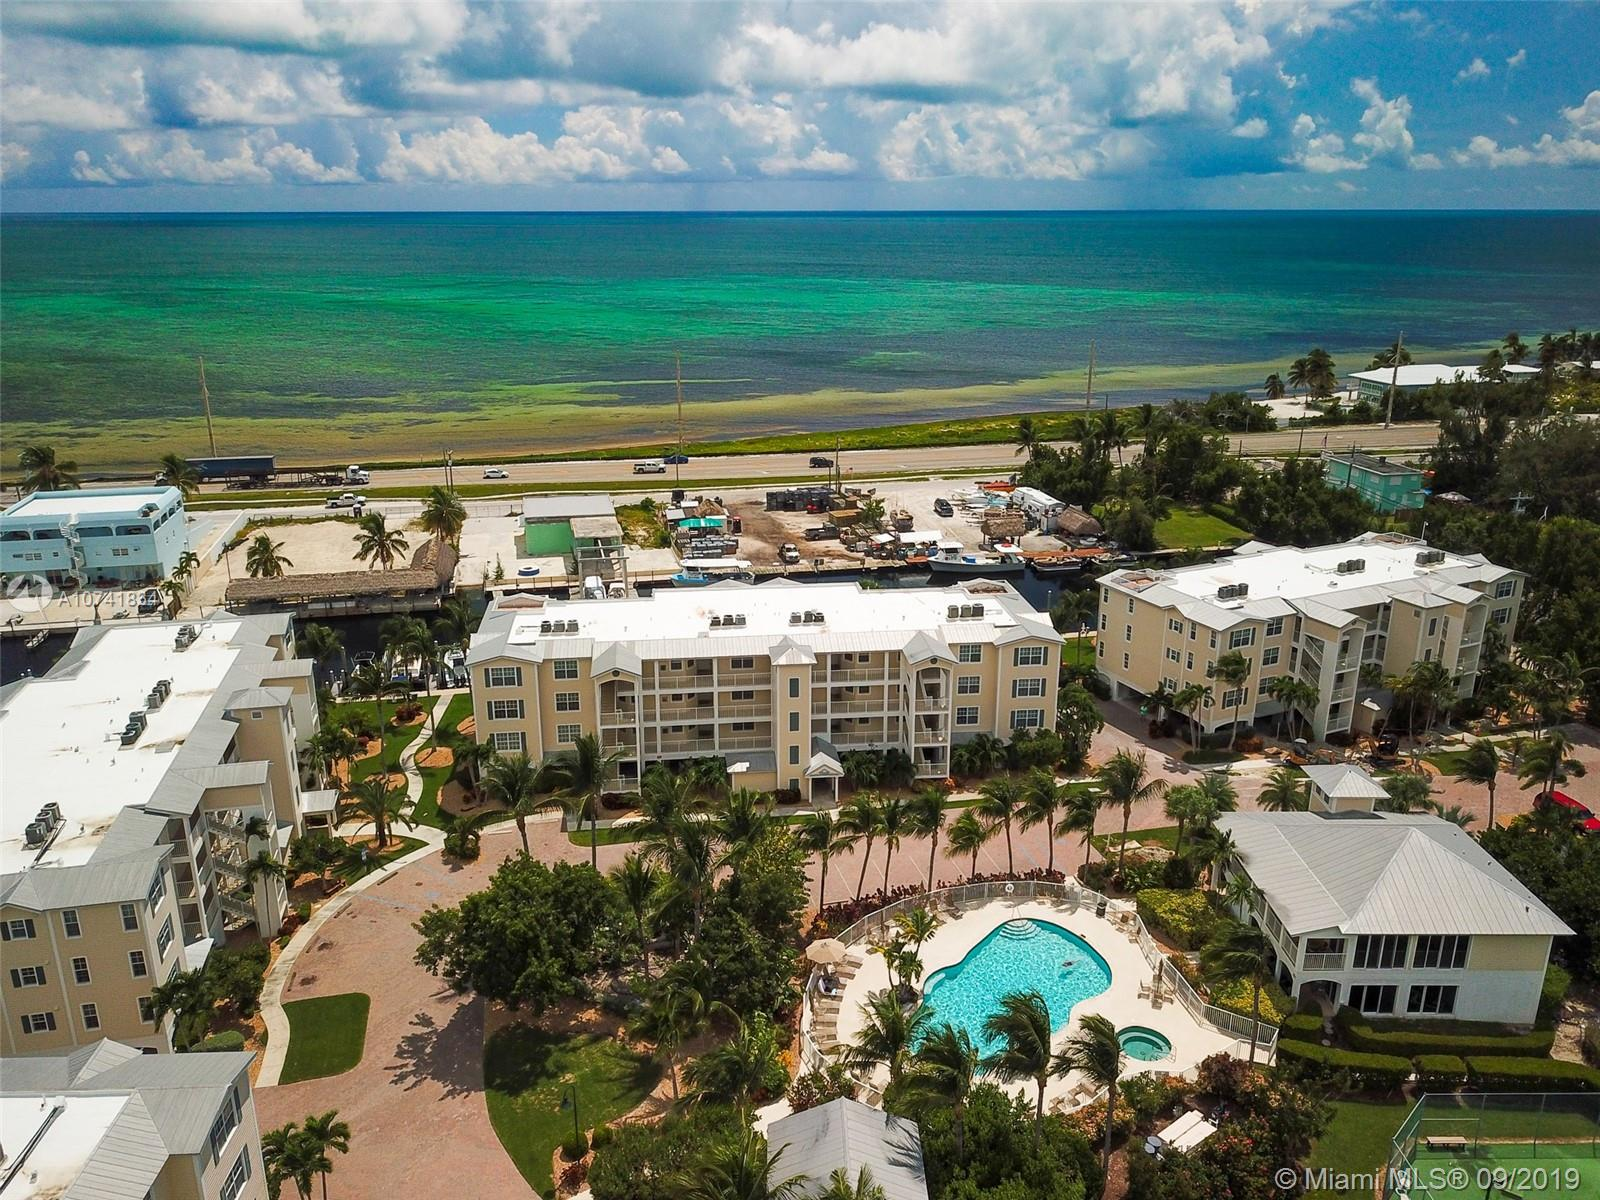 101 Gulfview 111 & Slip 28, Other City - Keys/Islands/Caribbean, FL 33036